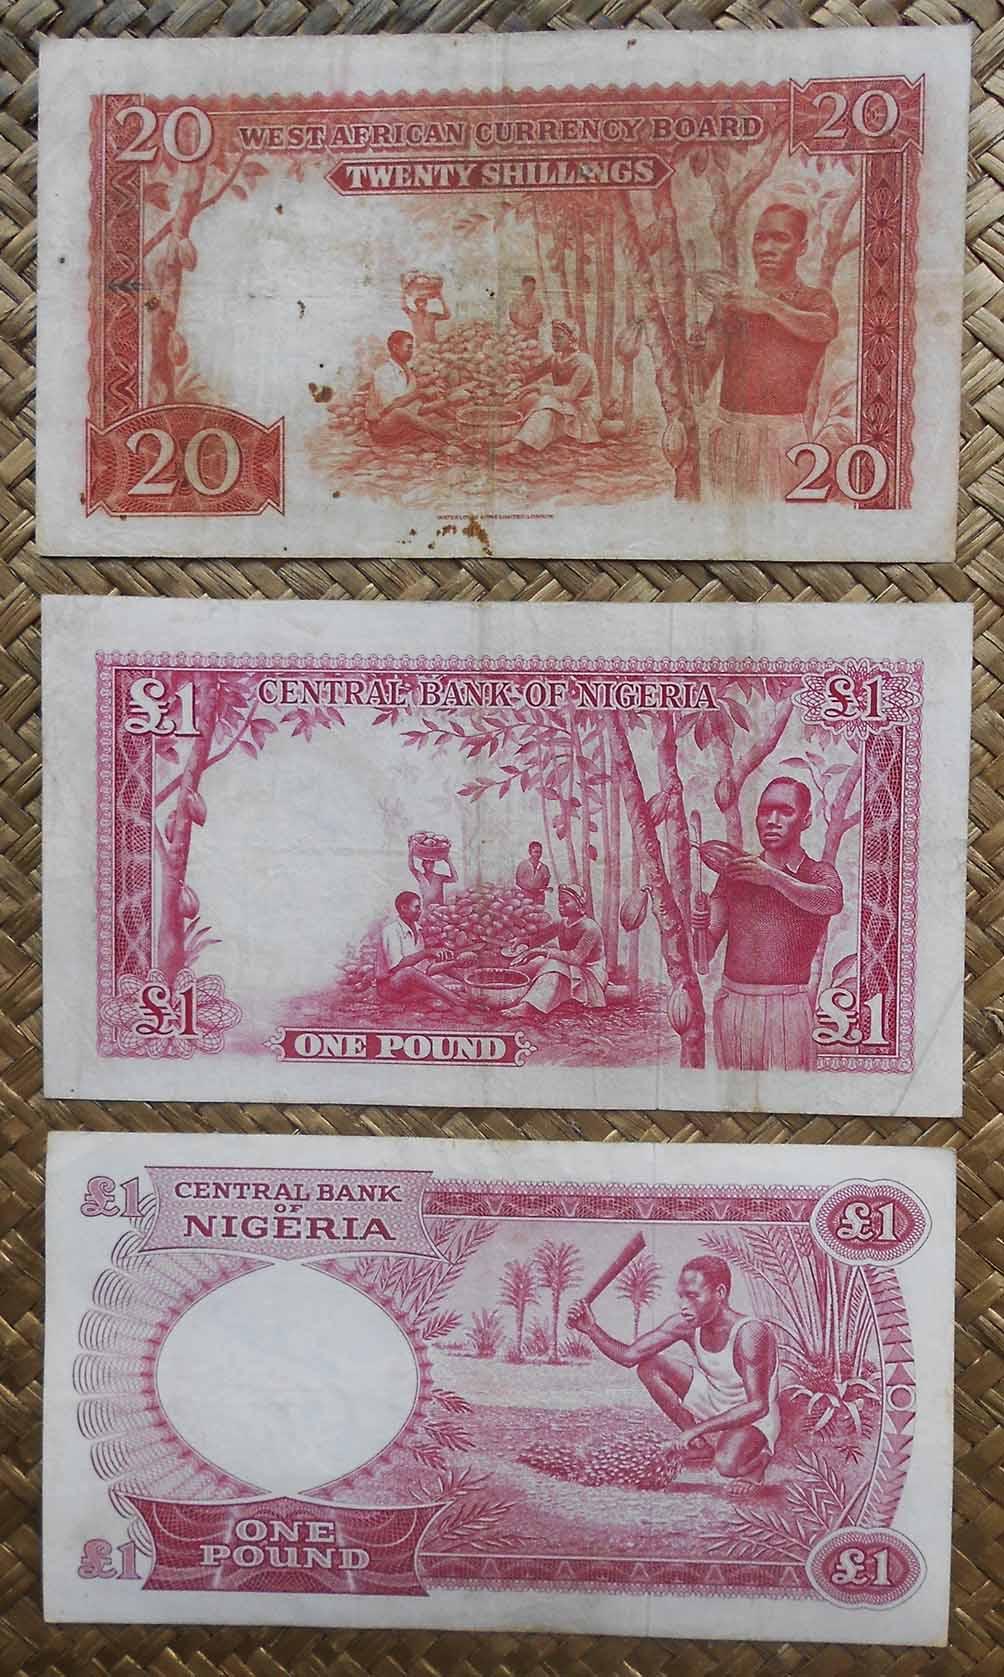 British West Africa vs. Nigeria 20 shilling 1953 vs. 1 pound 1958 vs. 1967 reversos